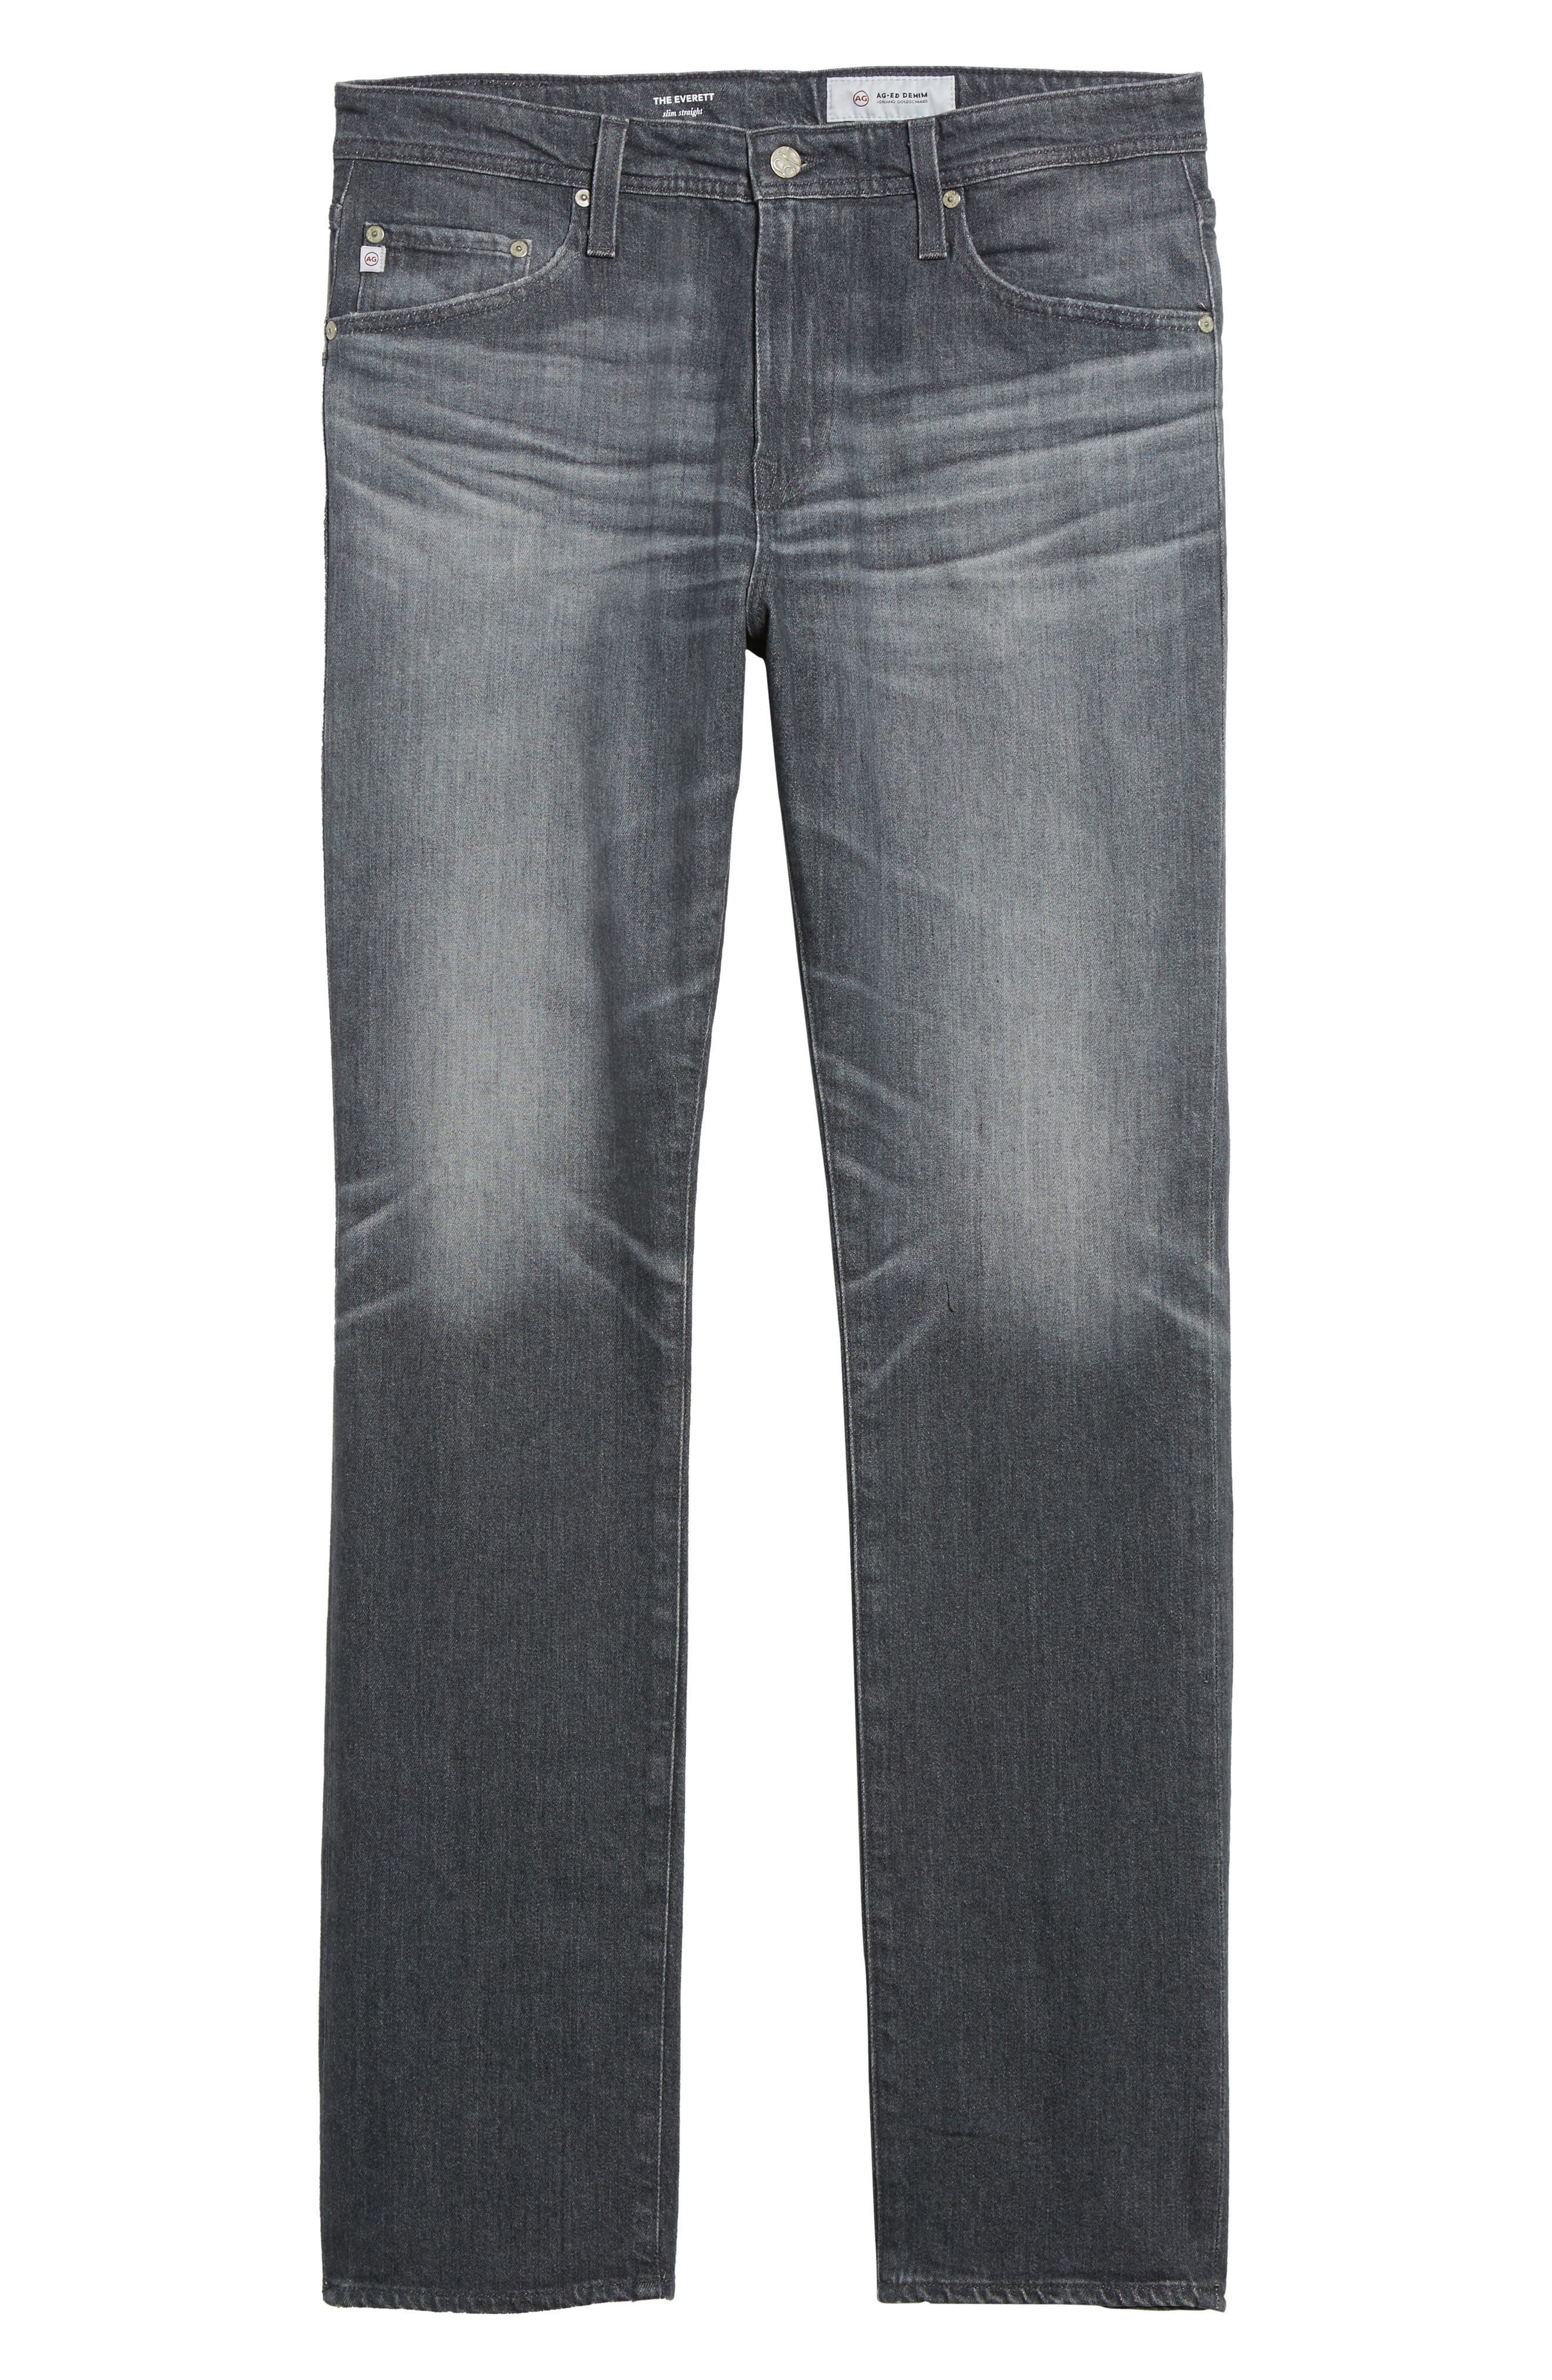 Everett Slim Straight Leg Jeans,                             Alternate thumbnail 6, color,                             5 Year Idle